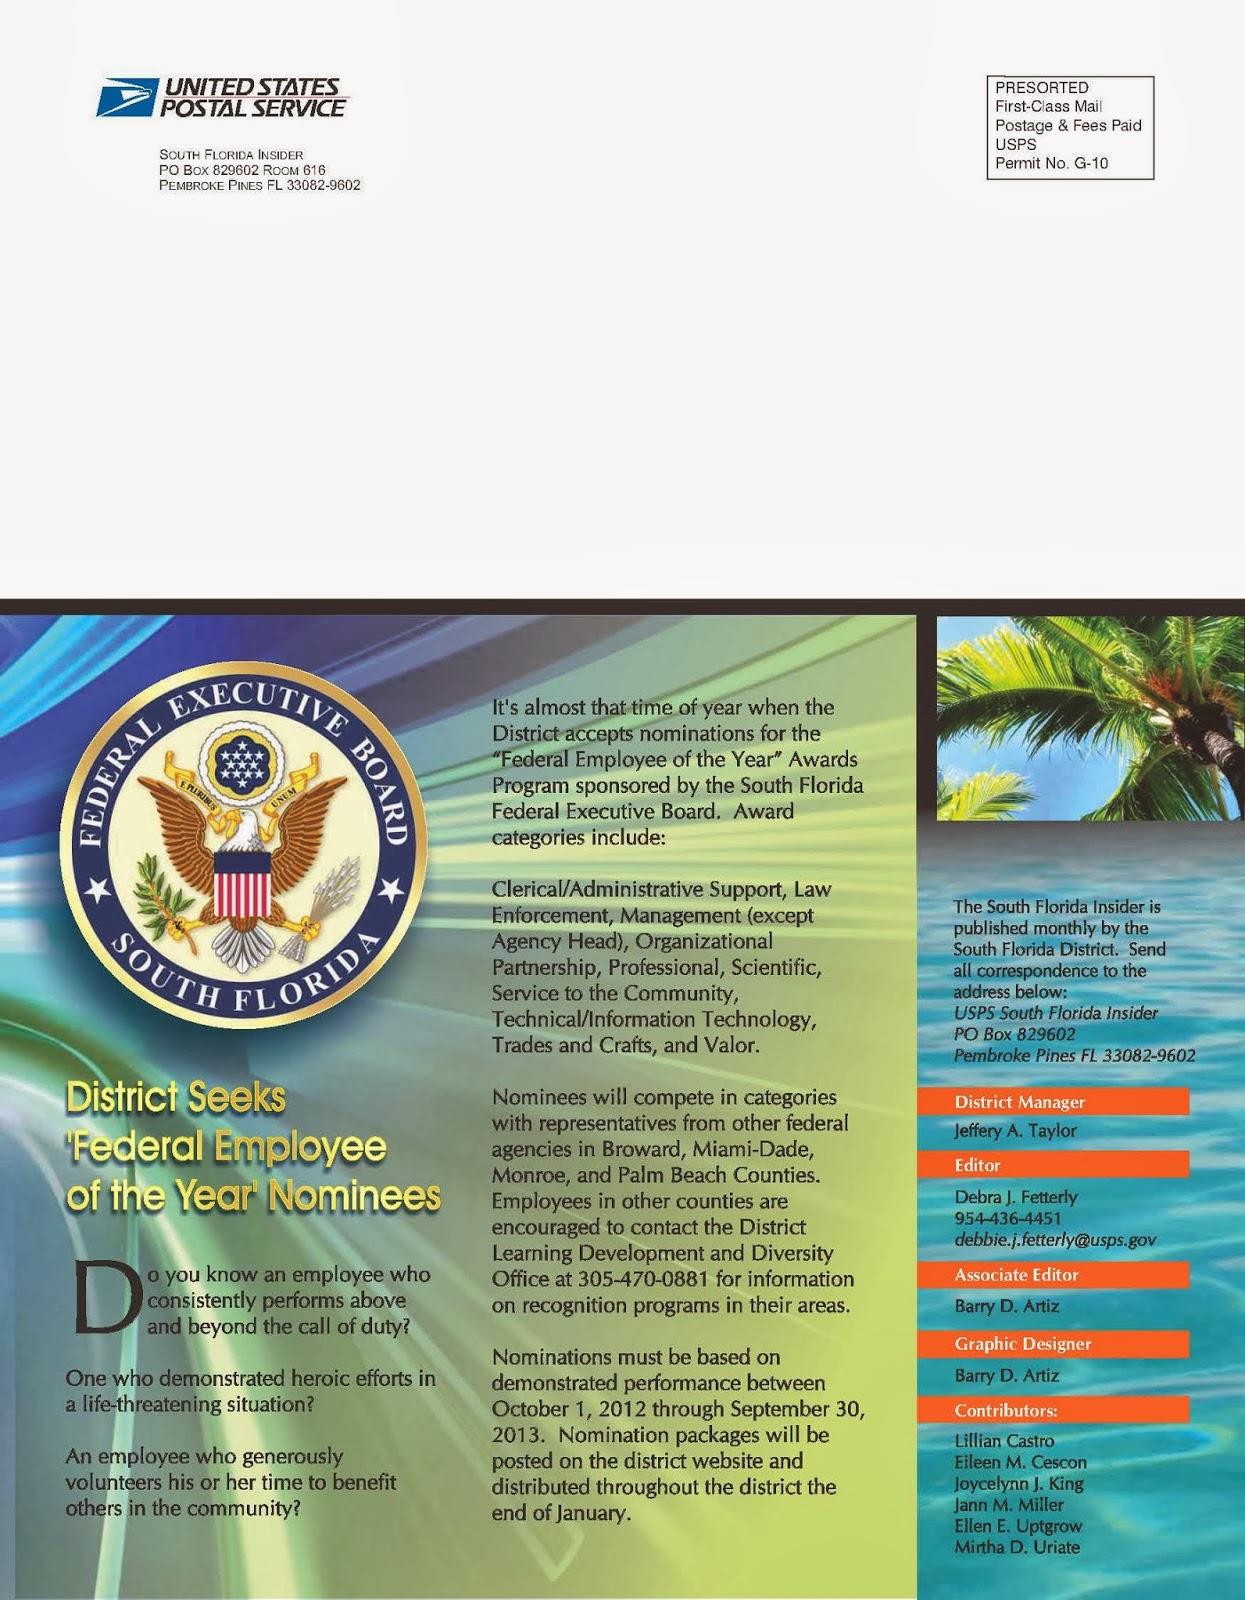 South Florida Postal Blog: January 2014